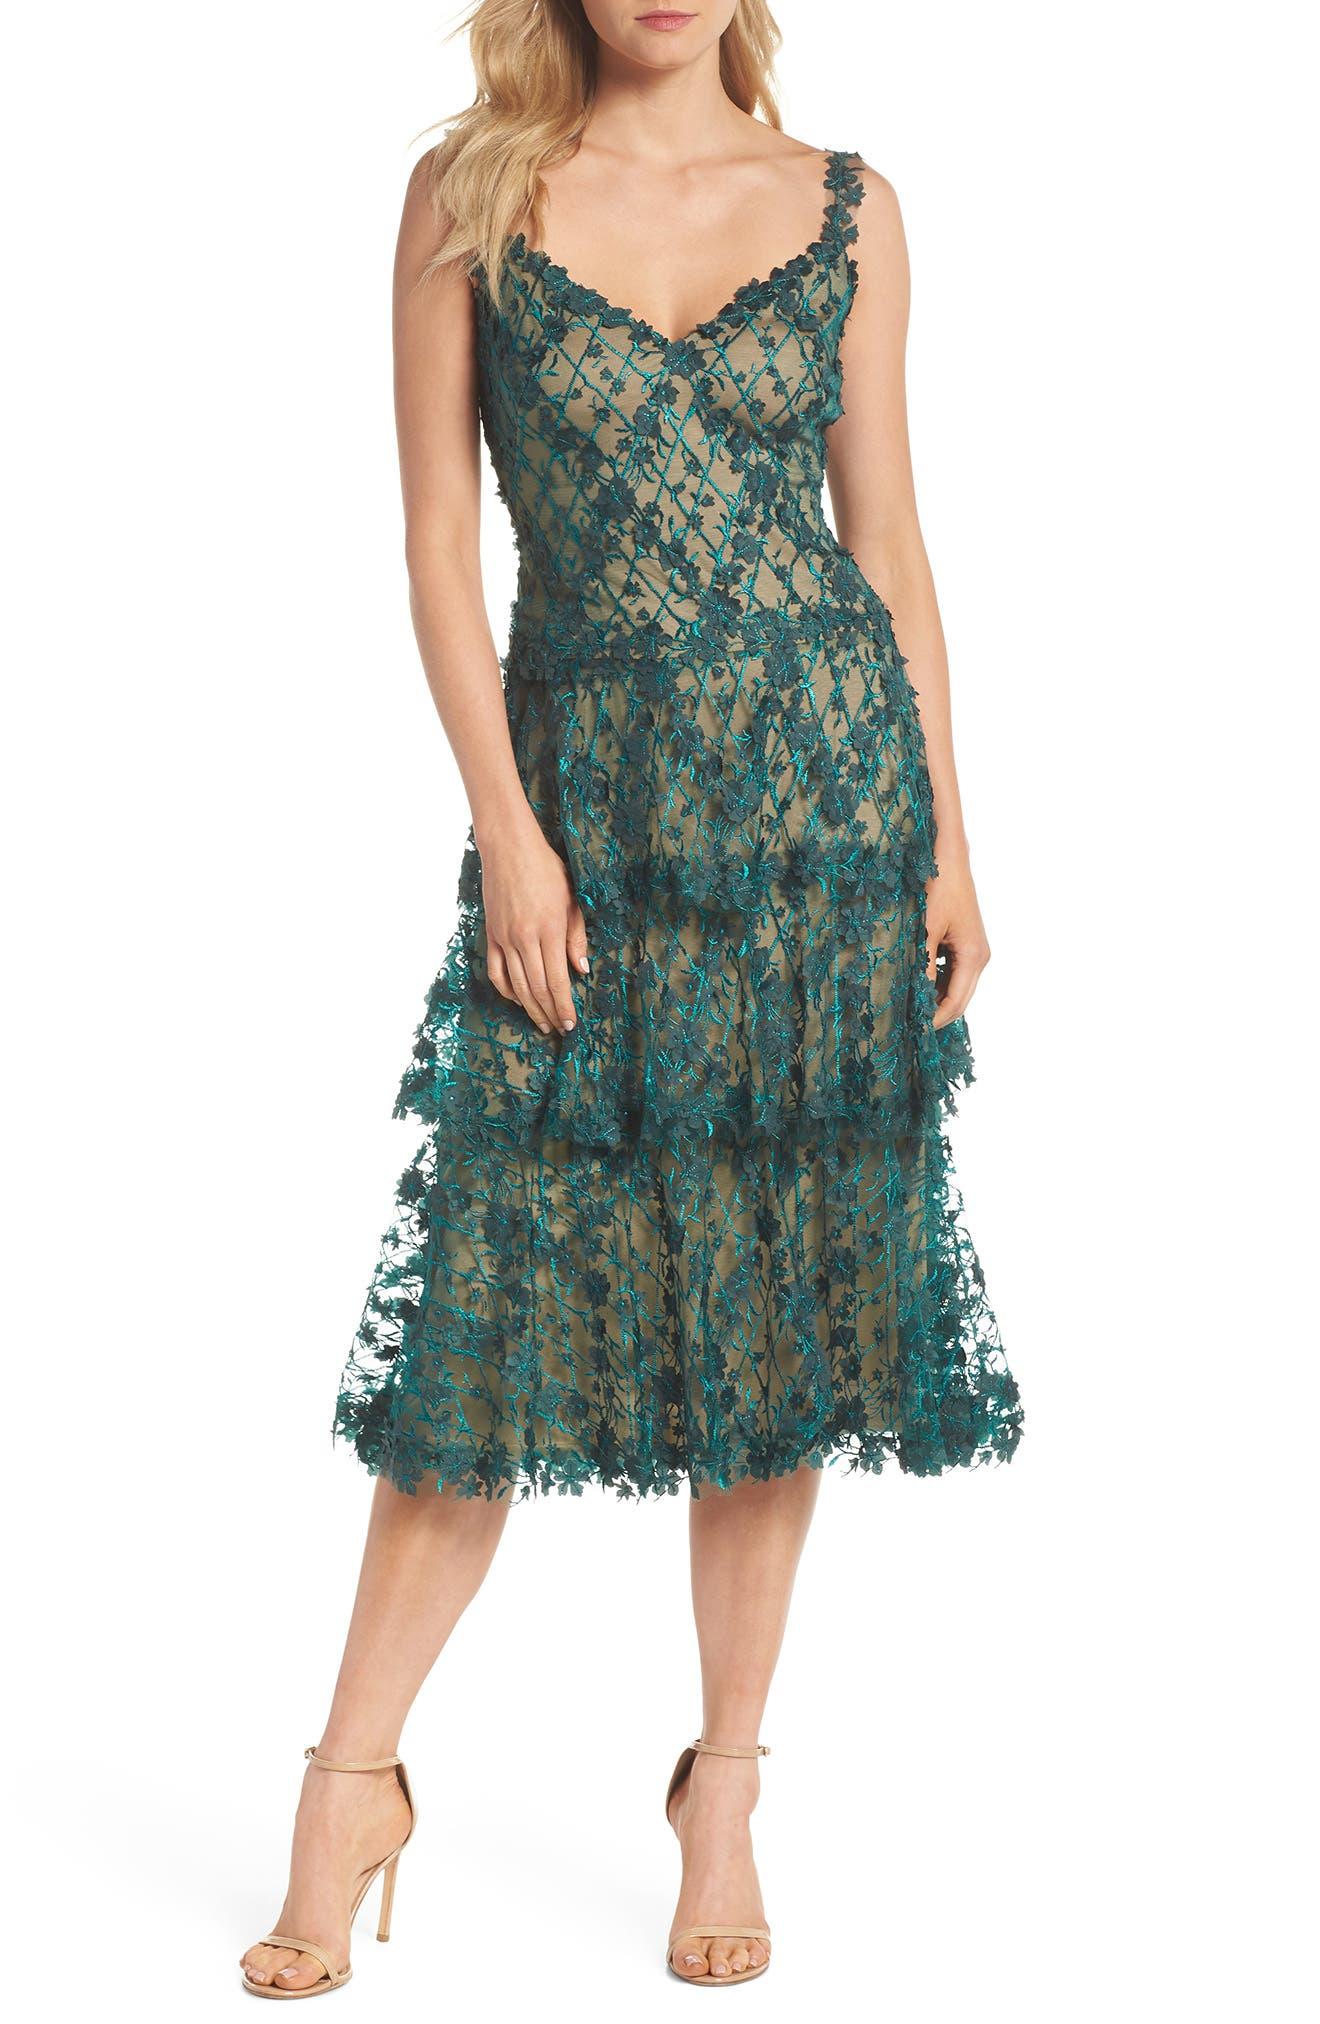 3D Floral Midi Dress,                             Main thumbnail 1, color,                             PINE/ NUDE